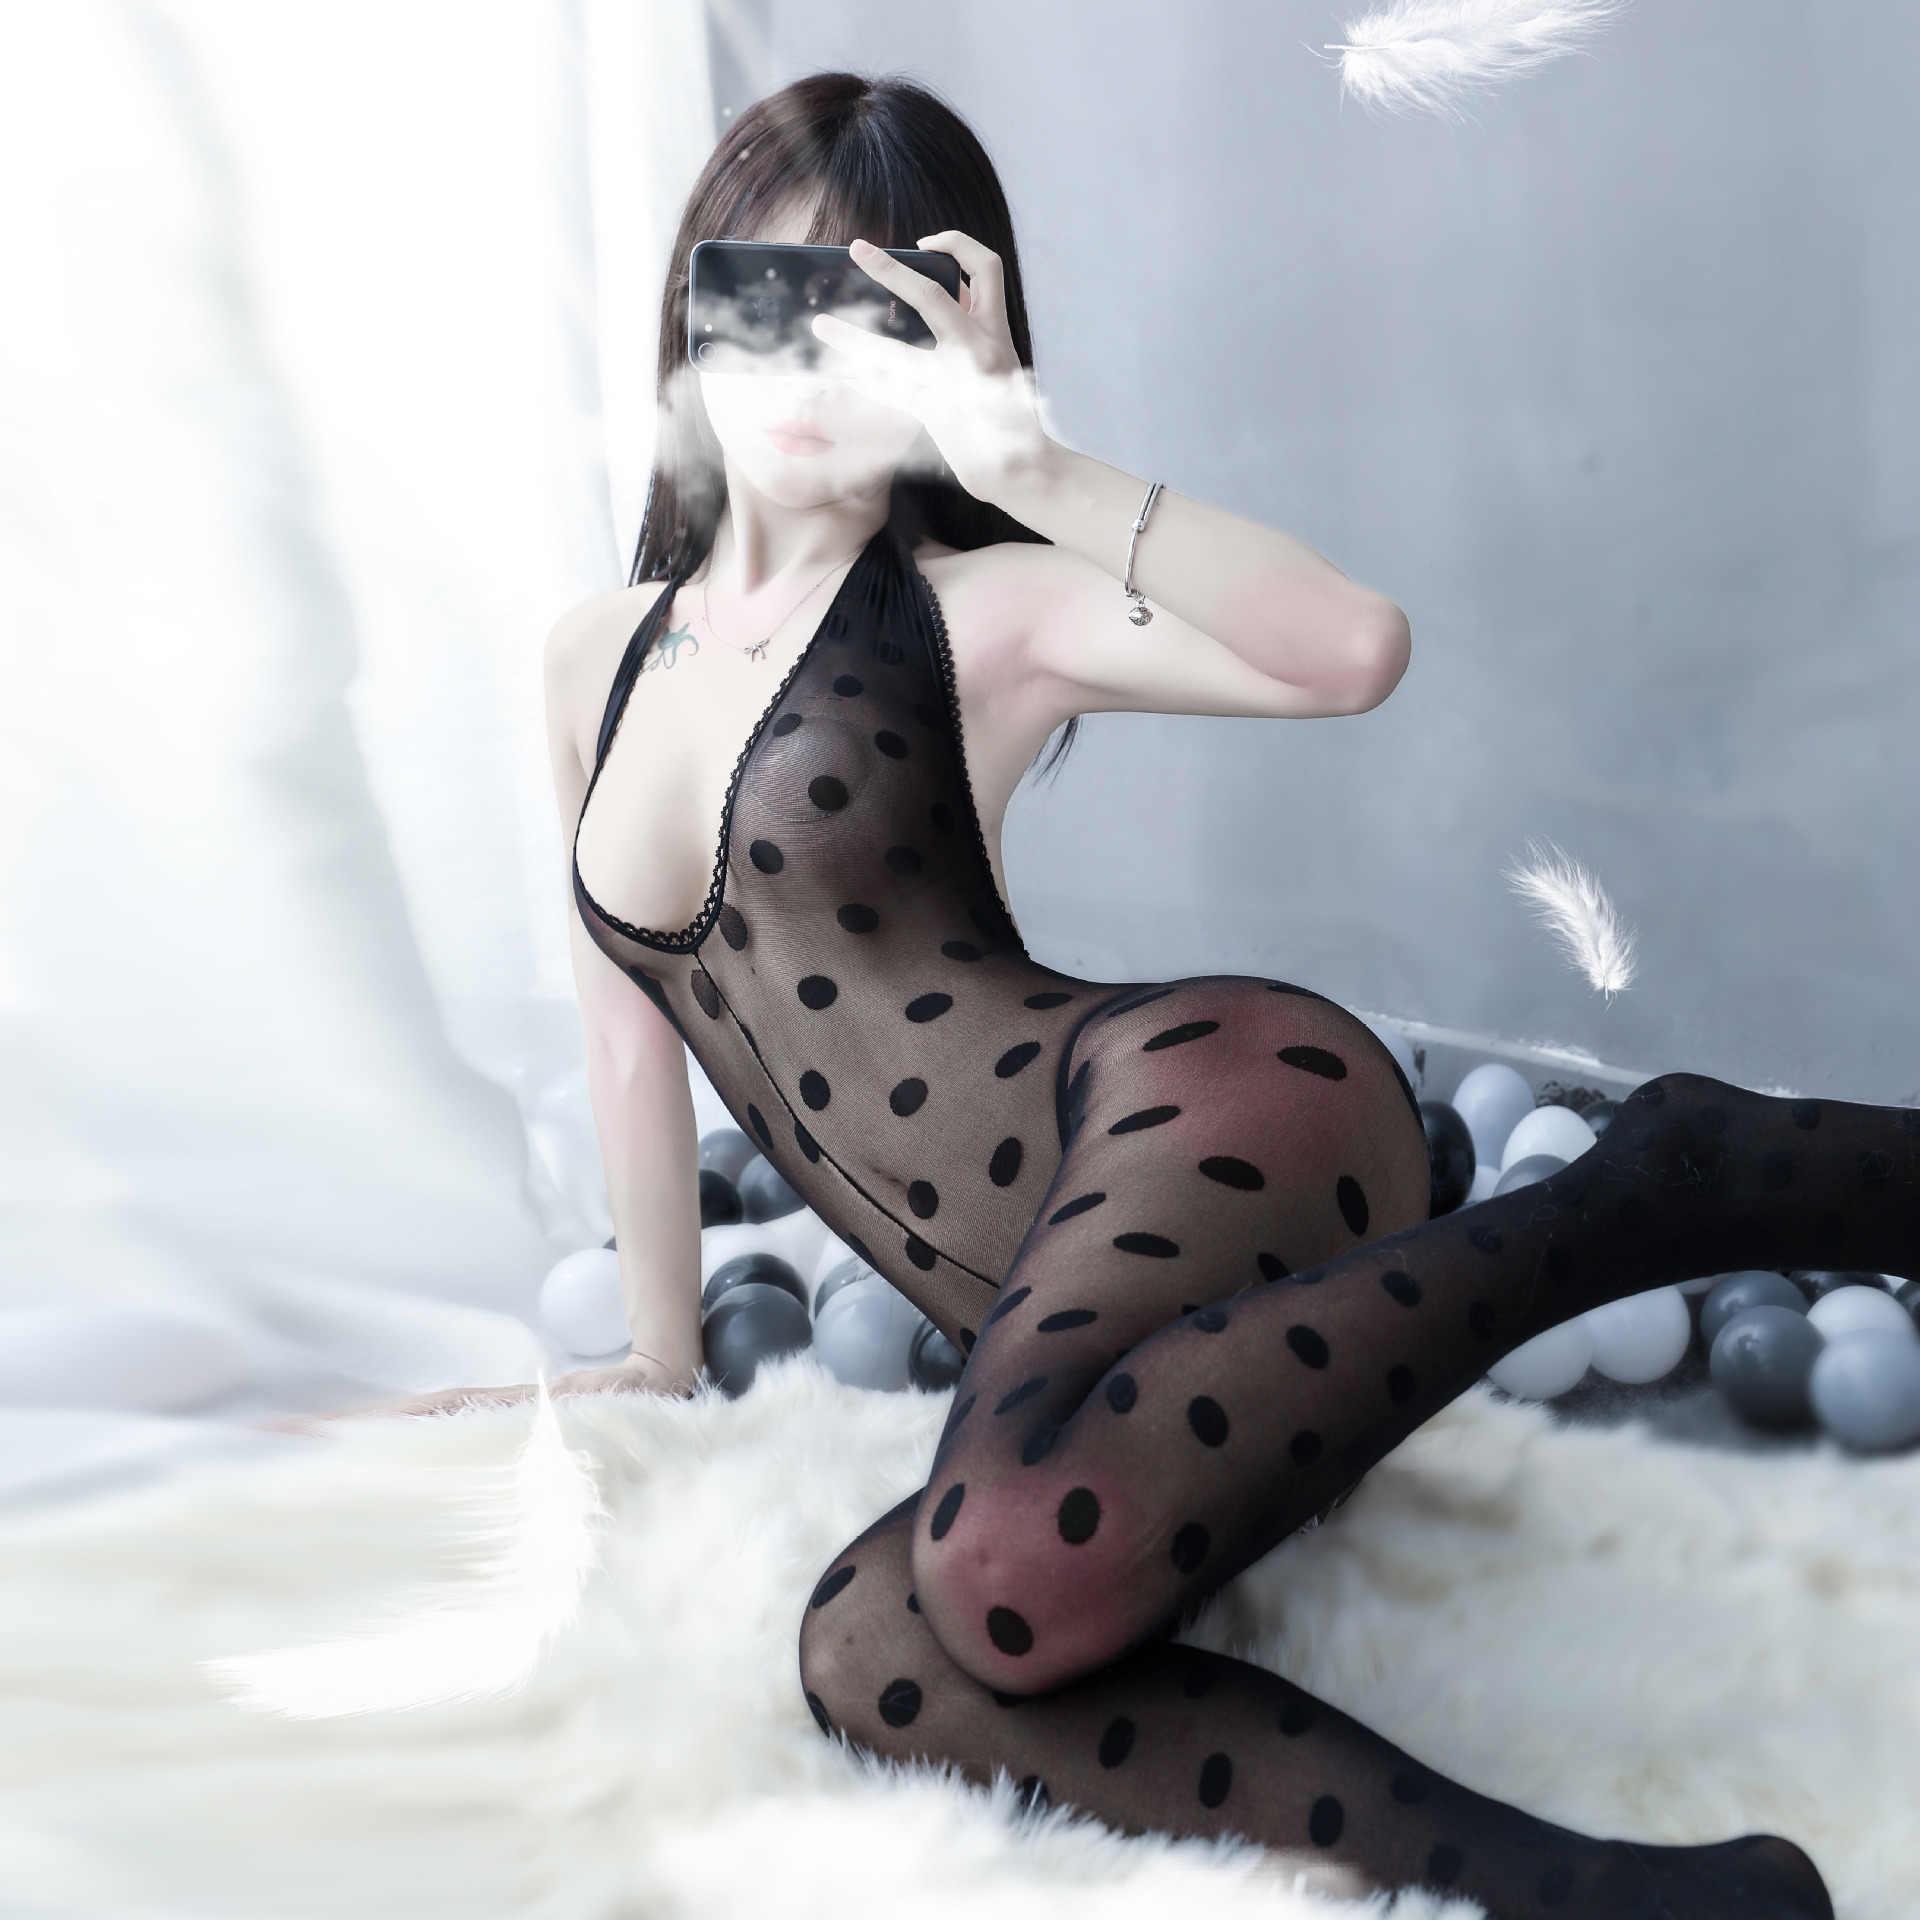 Pyjama Vrouwen Sexy Lingerie Porno Open Kruis Hollow Kousen Jarretellegordel Visnet Panty Transparante Panty Kous